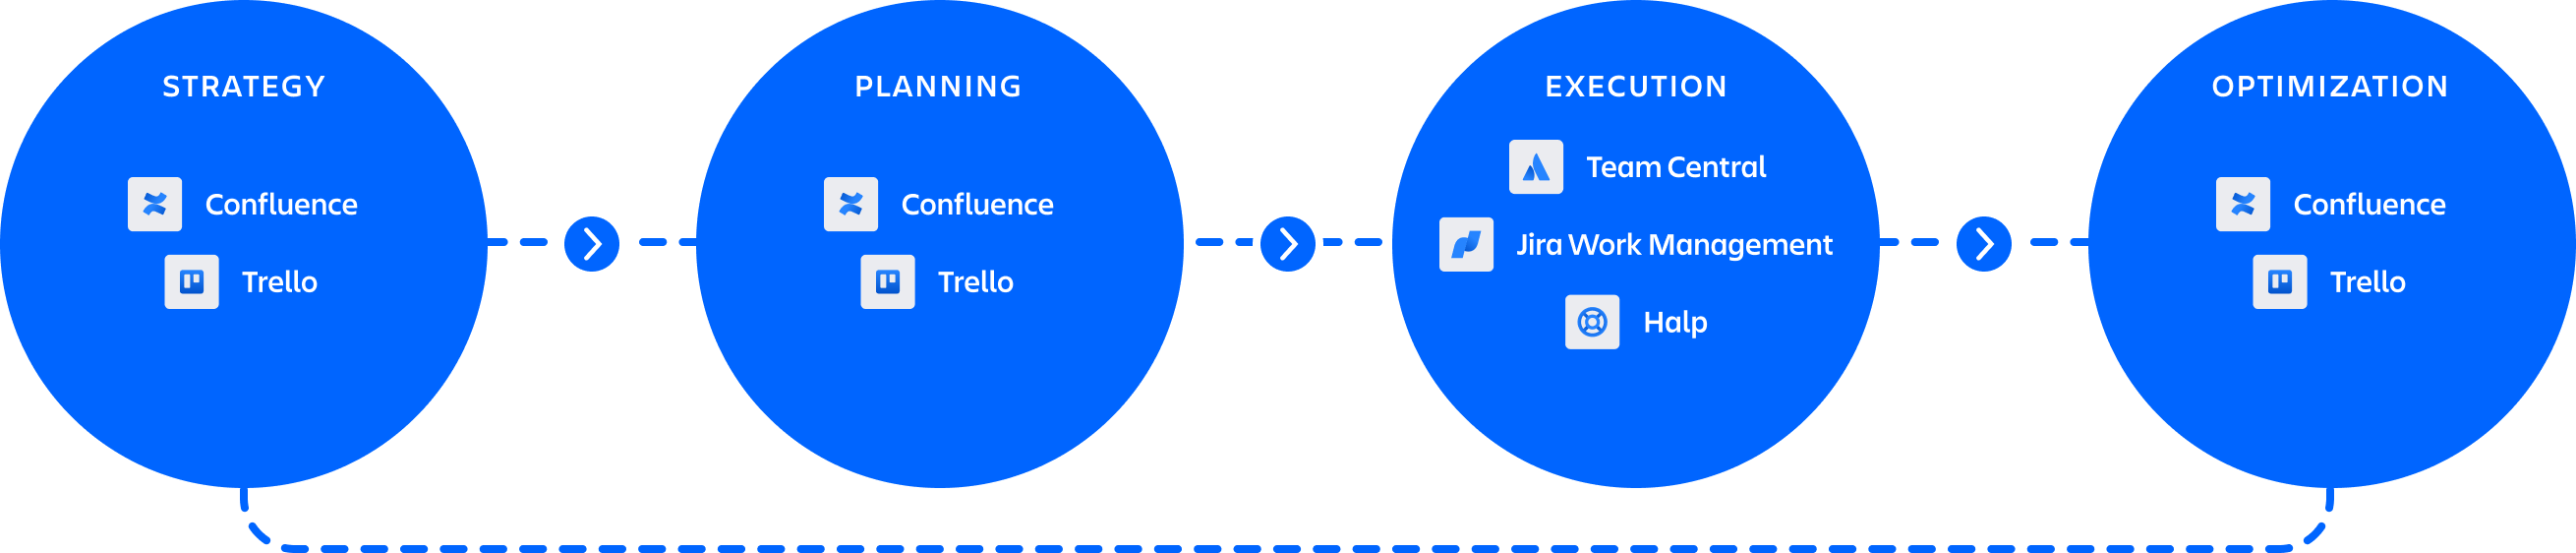 人才招聘产品的图形:Confluence 和 Jira Work Management,其中包含新人培训产品:Trello 和 Jira Work Management